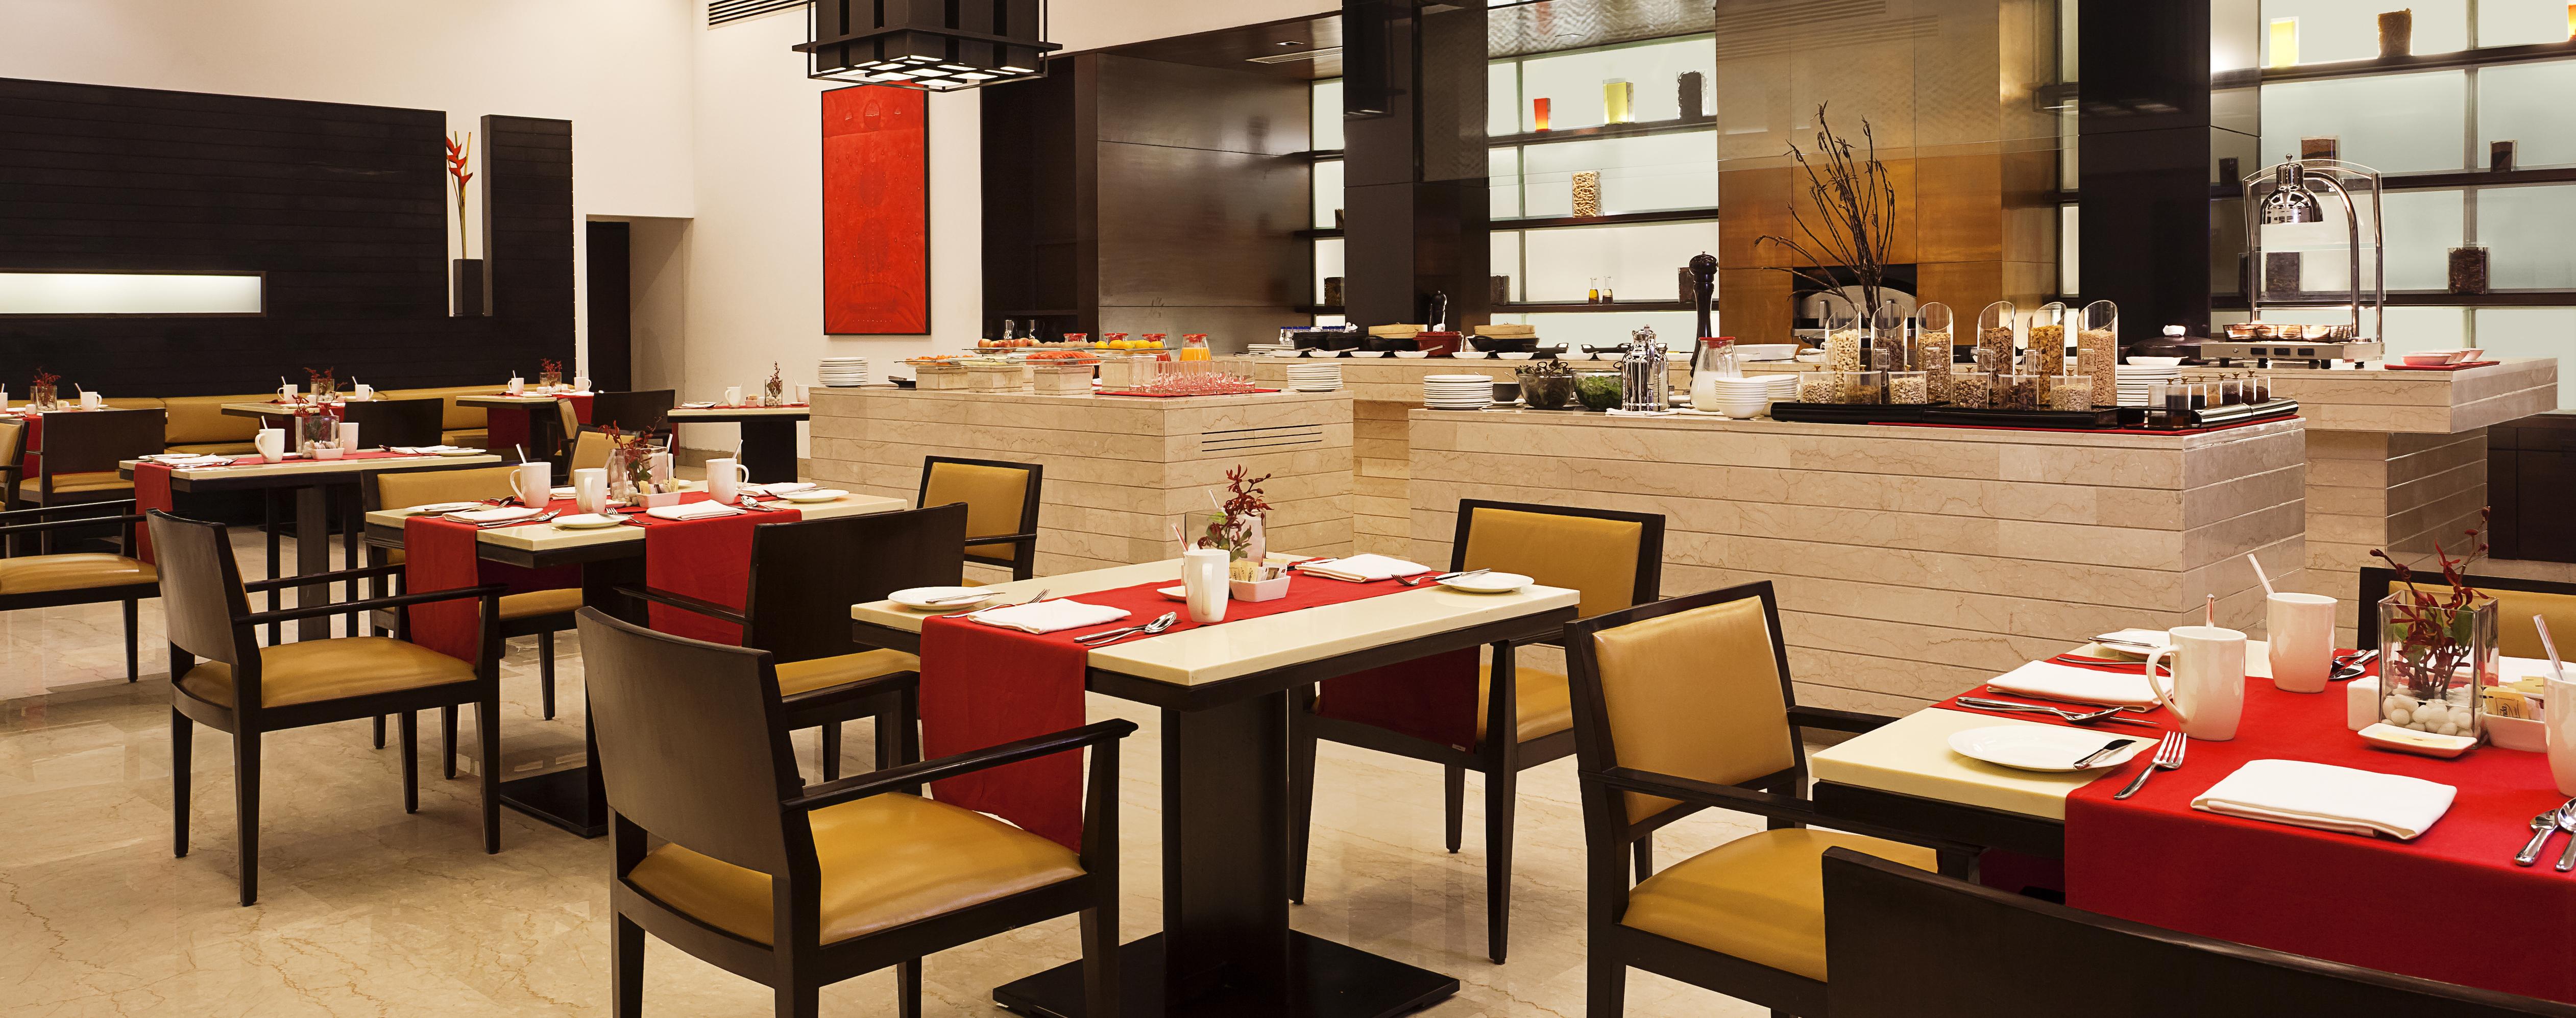 Trident-Agra-Restaurant